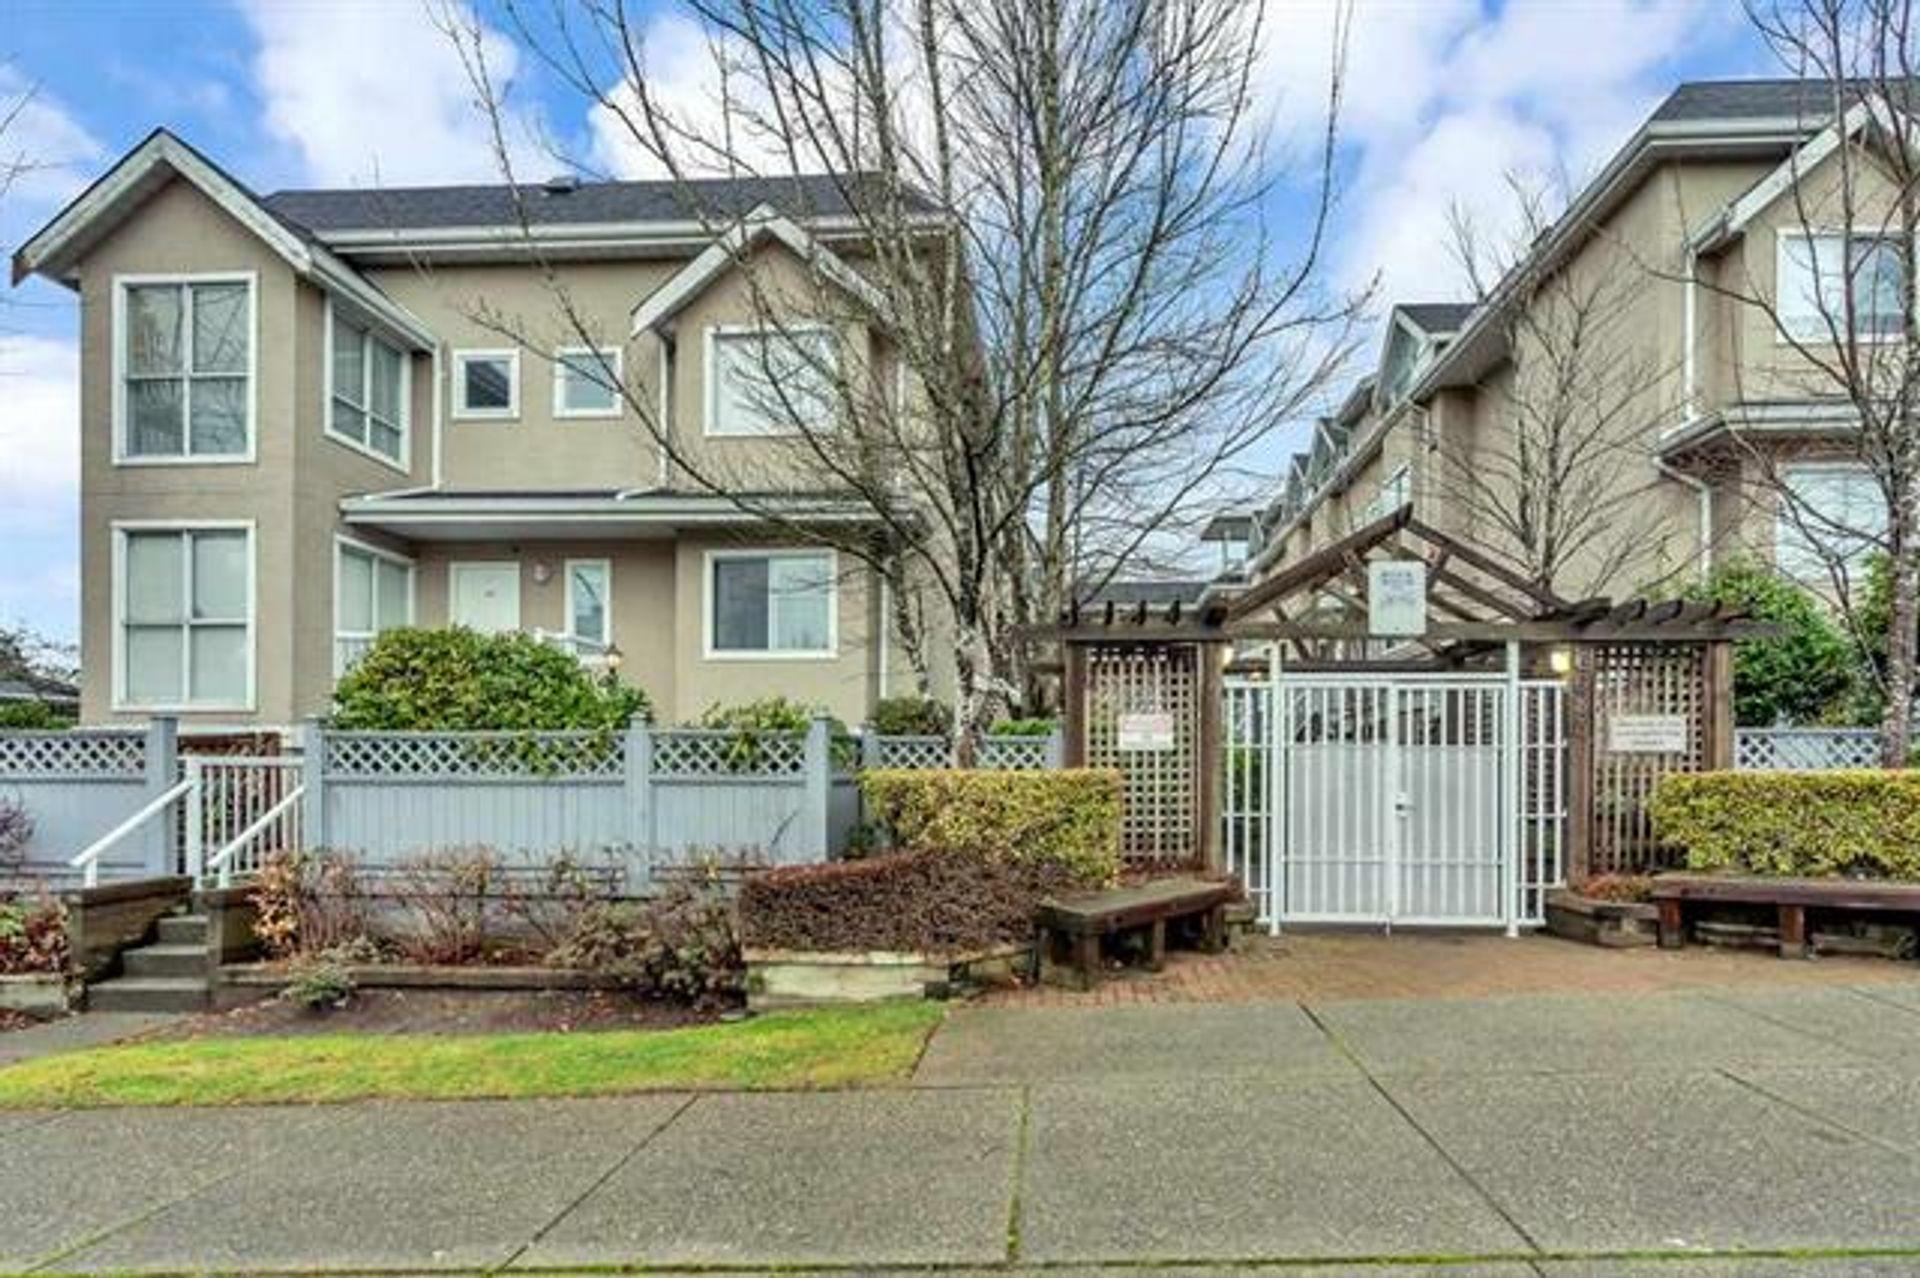 206 - 3683 Wellington Avenue, Collingwood VE, Vancouver East photo number 1